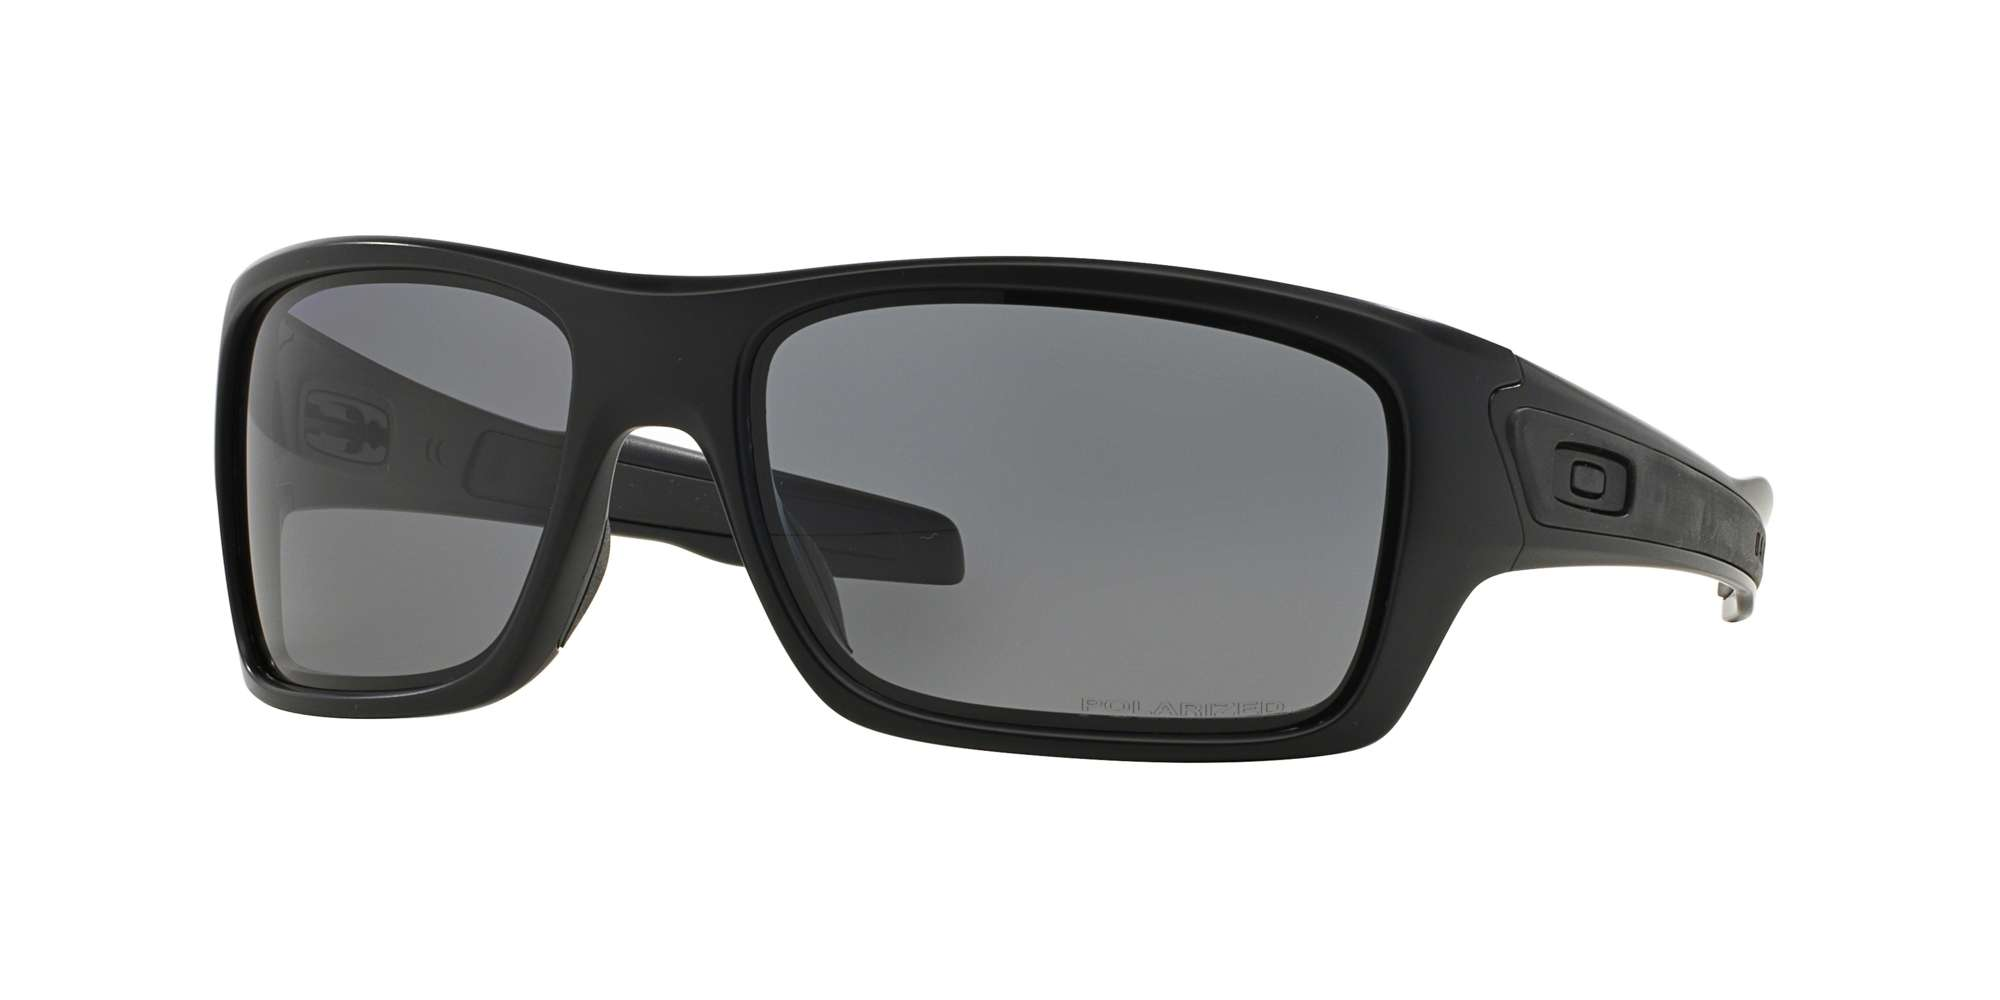 MATTE BLACK / GREY POLARIZED lenses